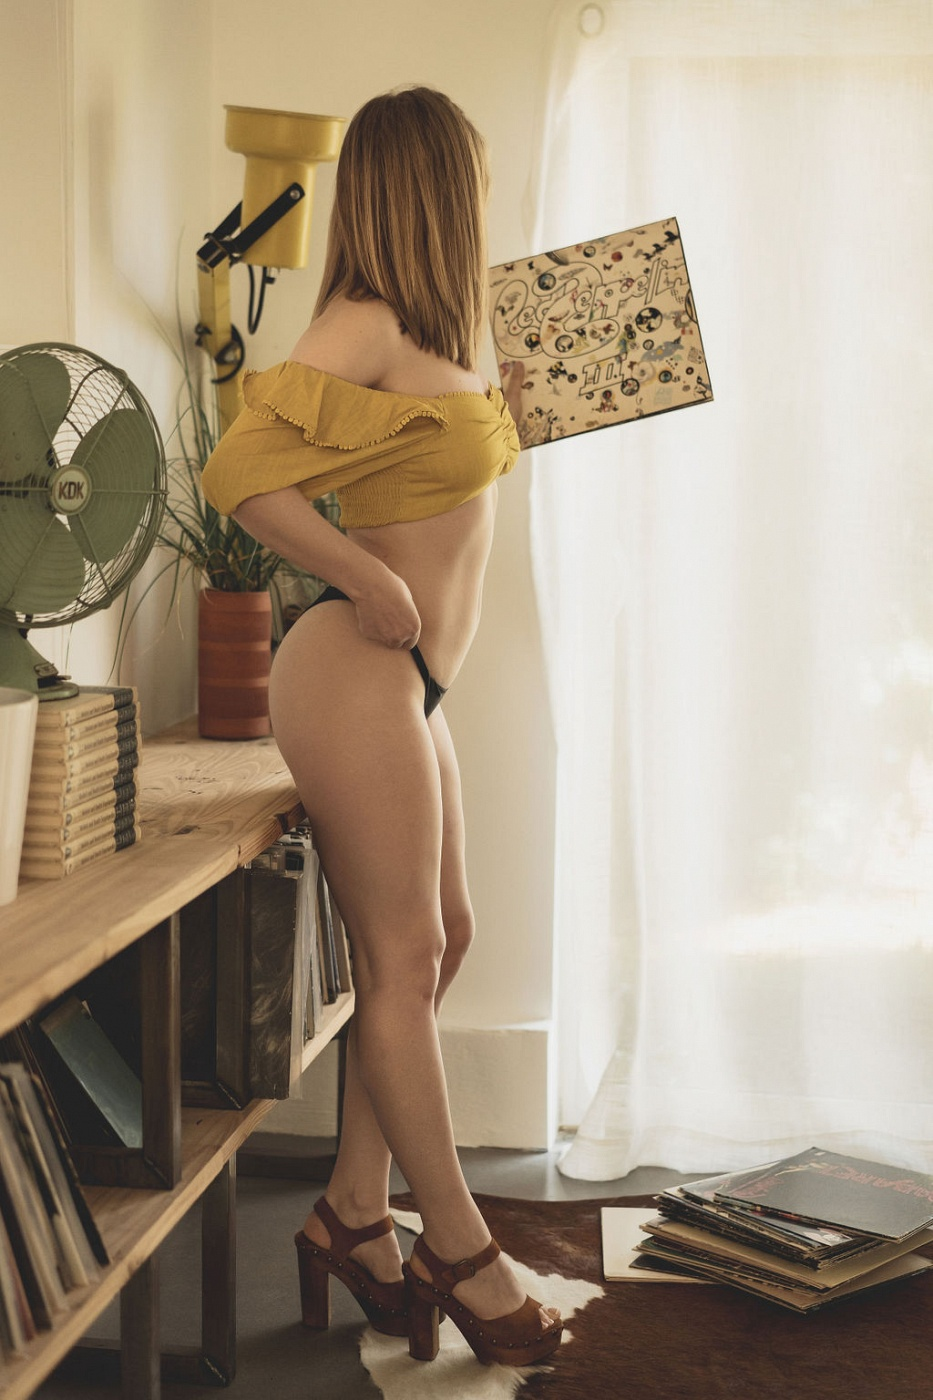 Agnes DeLune